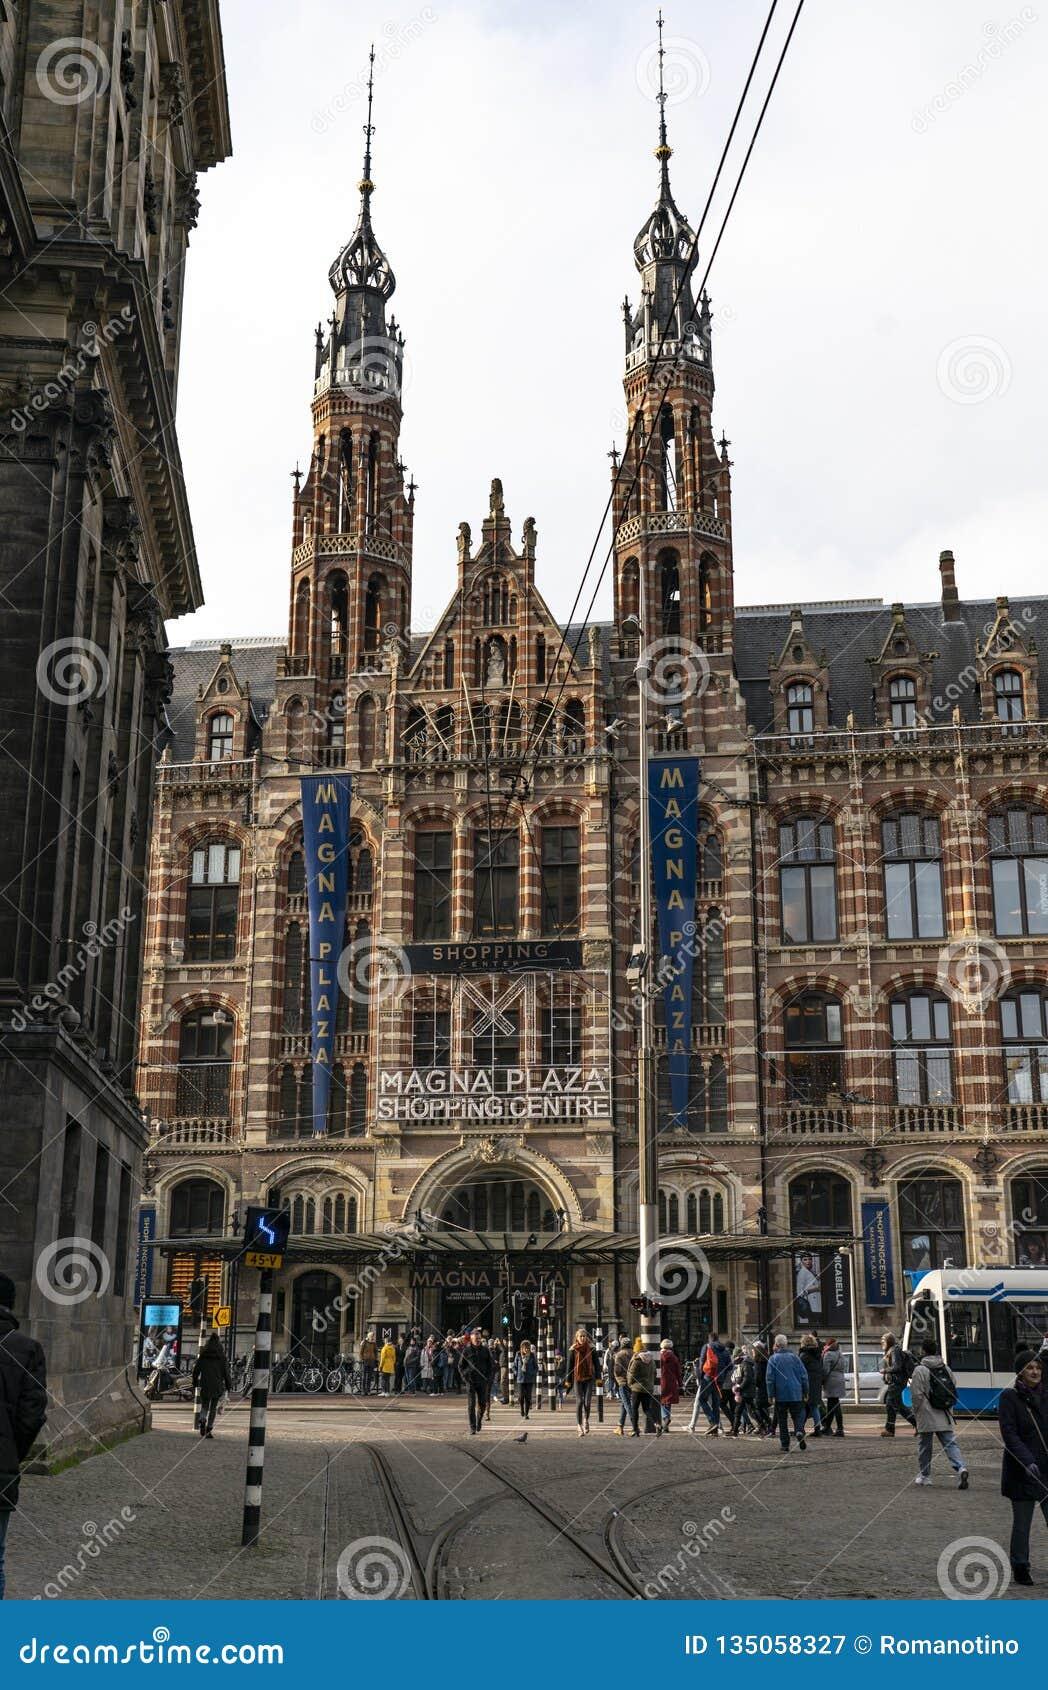 Amsterdam Magna Plaza Shopping Center